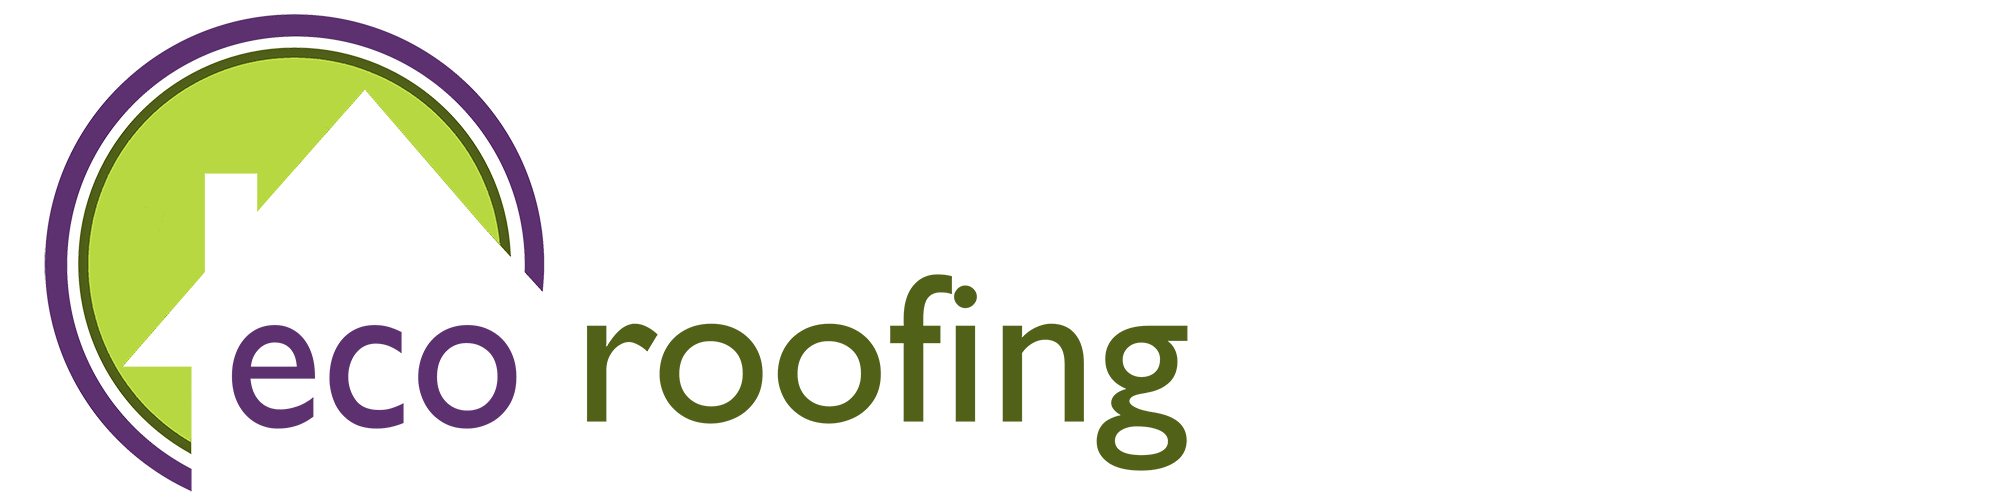 Zinc roofing in London, Zinc Cladding in London, Zinc contractor in London